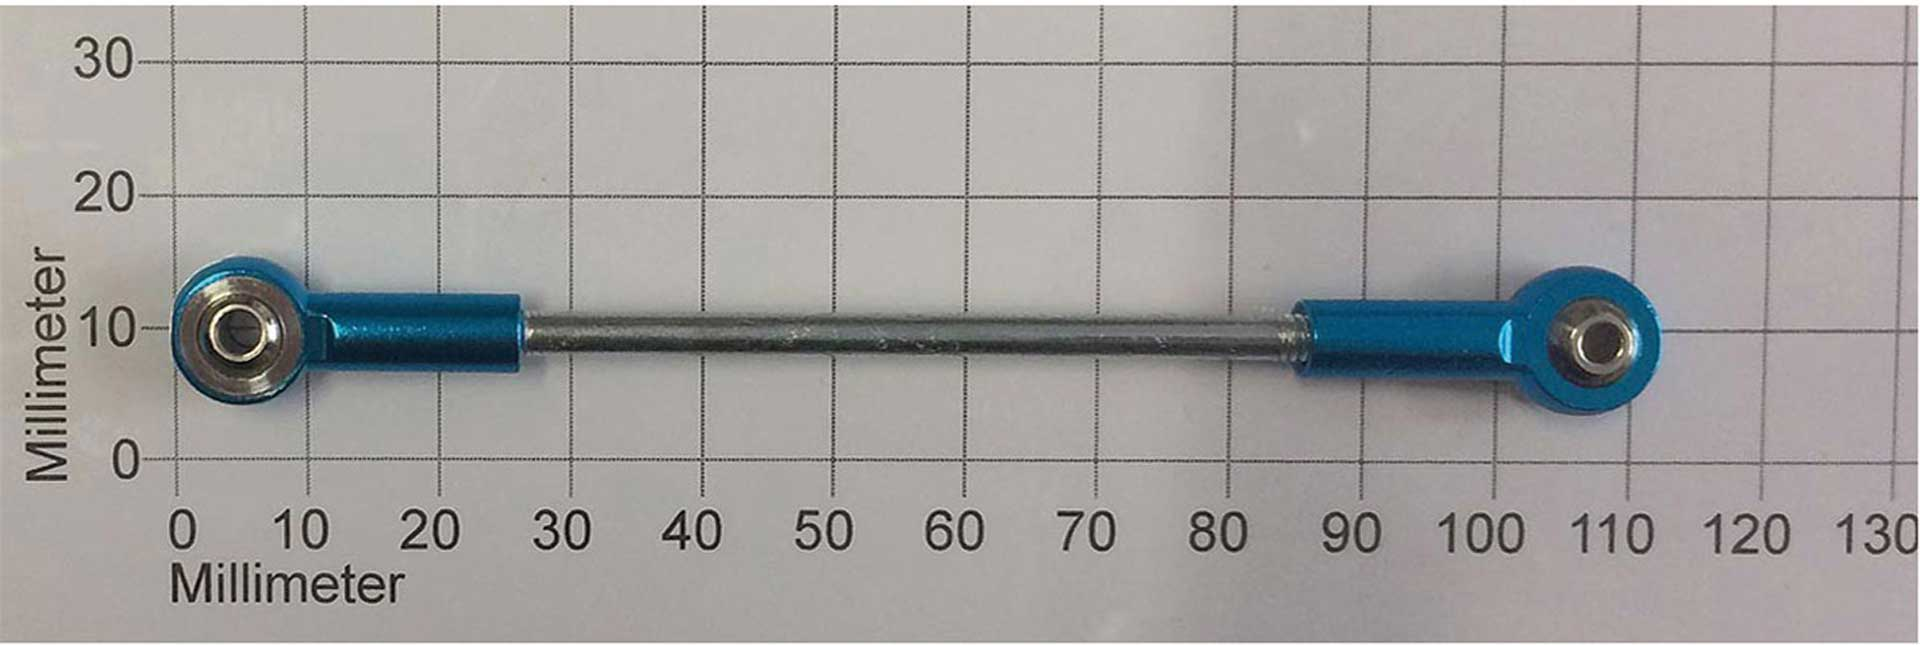 ROBBE Anlenkungsgestänge Metall M3XL26MM